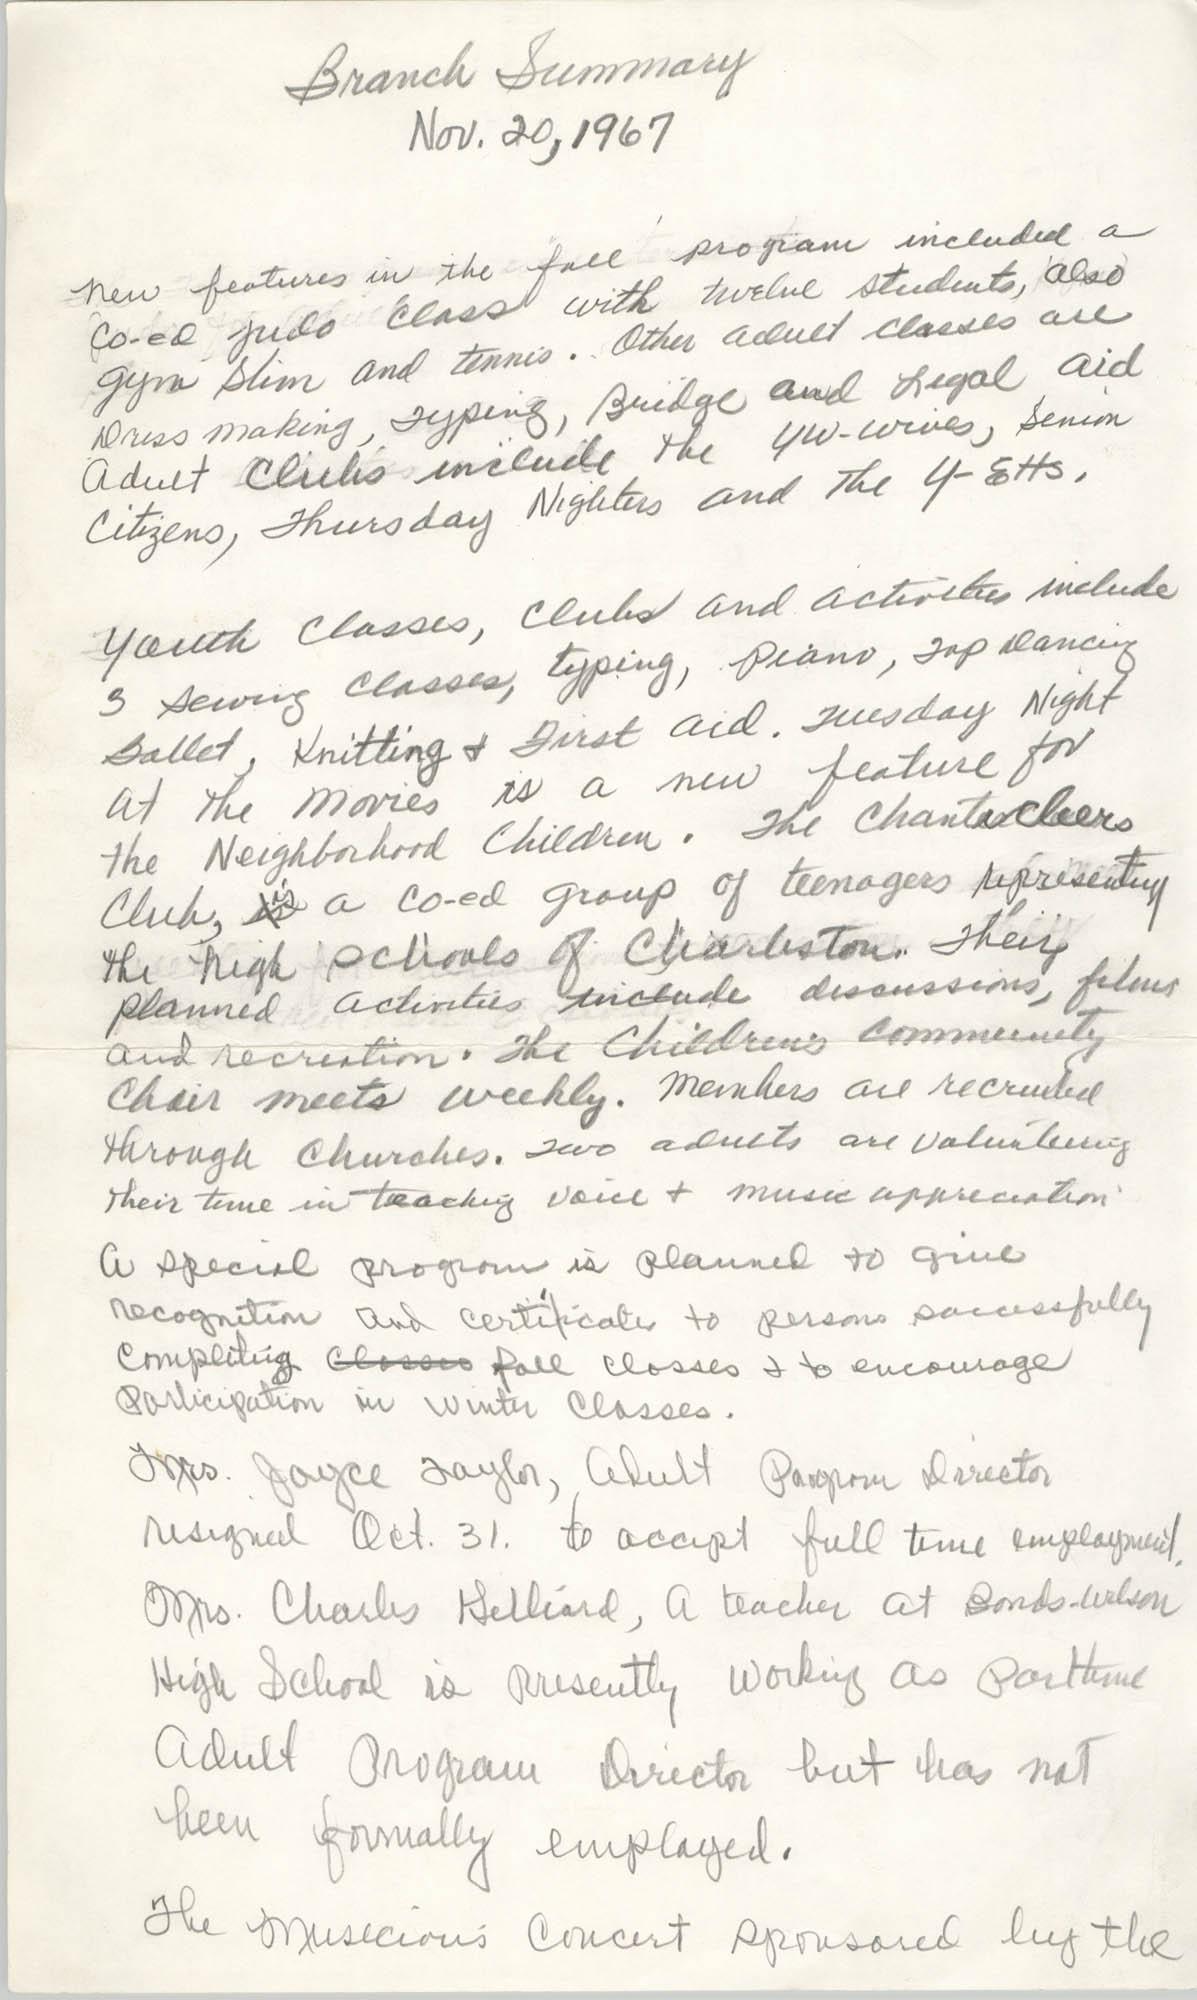 Coming Street Y.W.C.A. Branch Summary, November 20, 1967